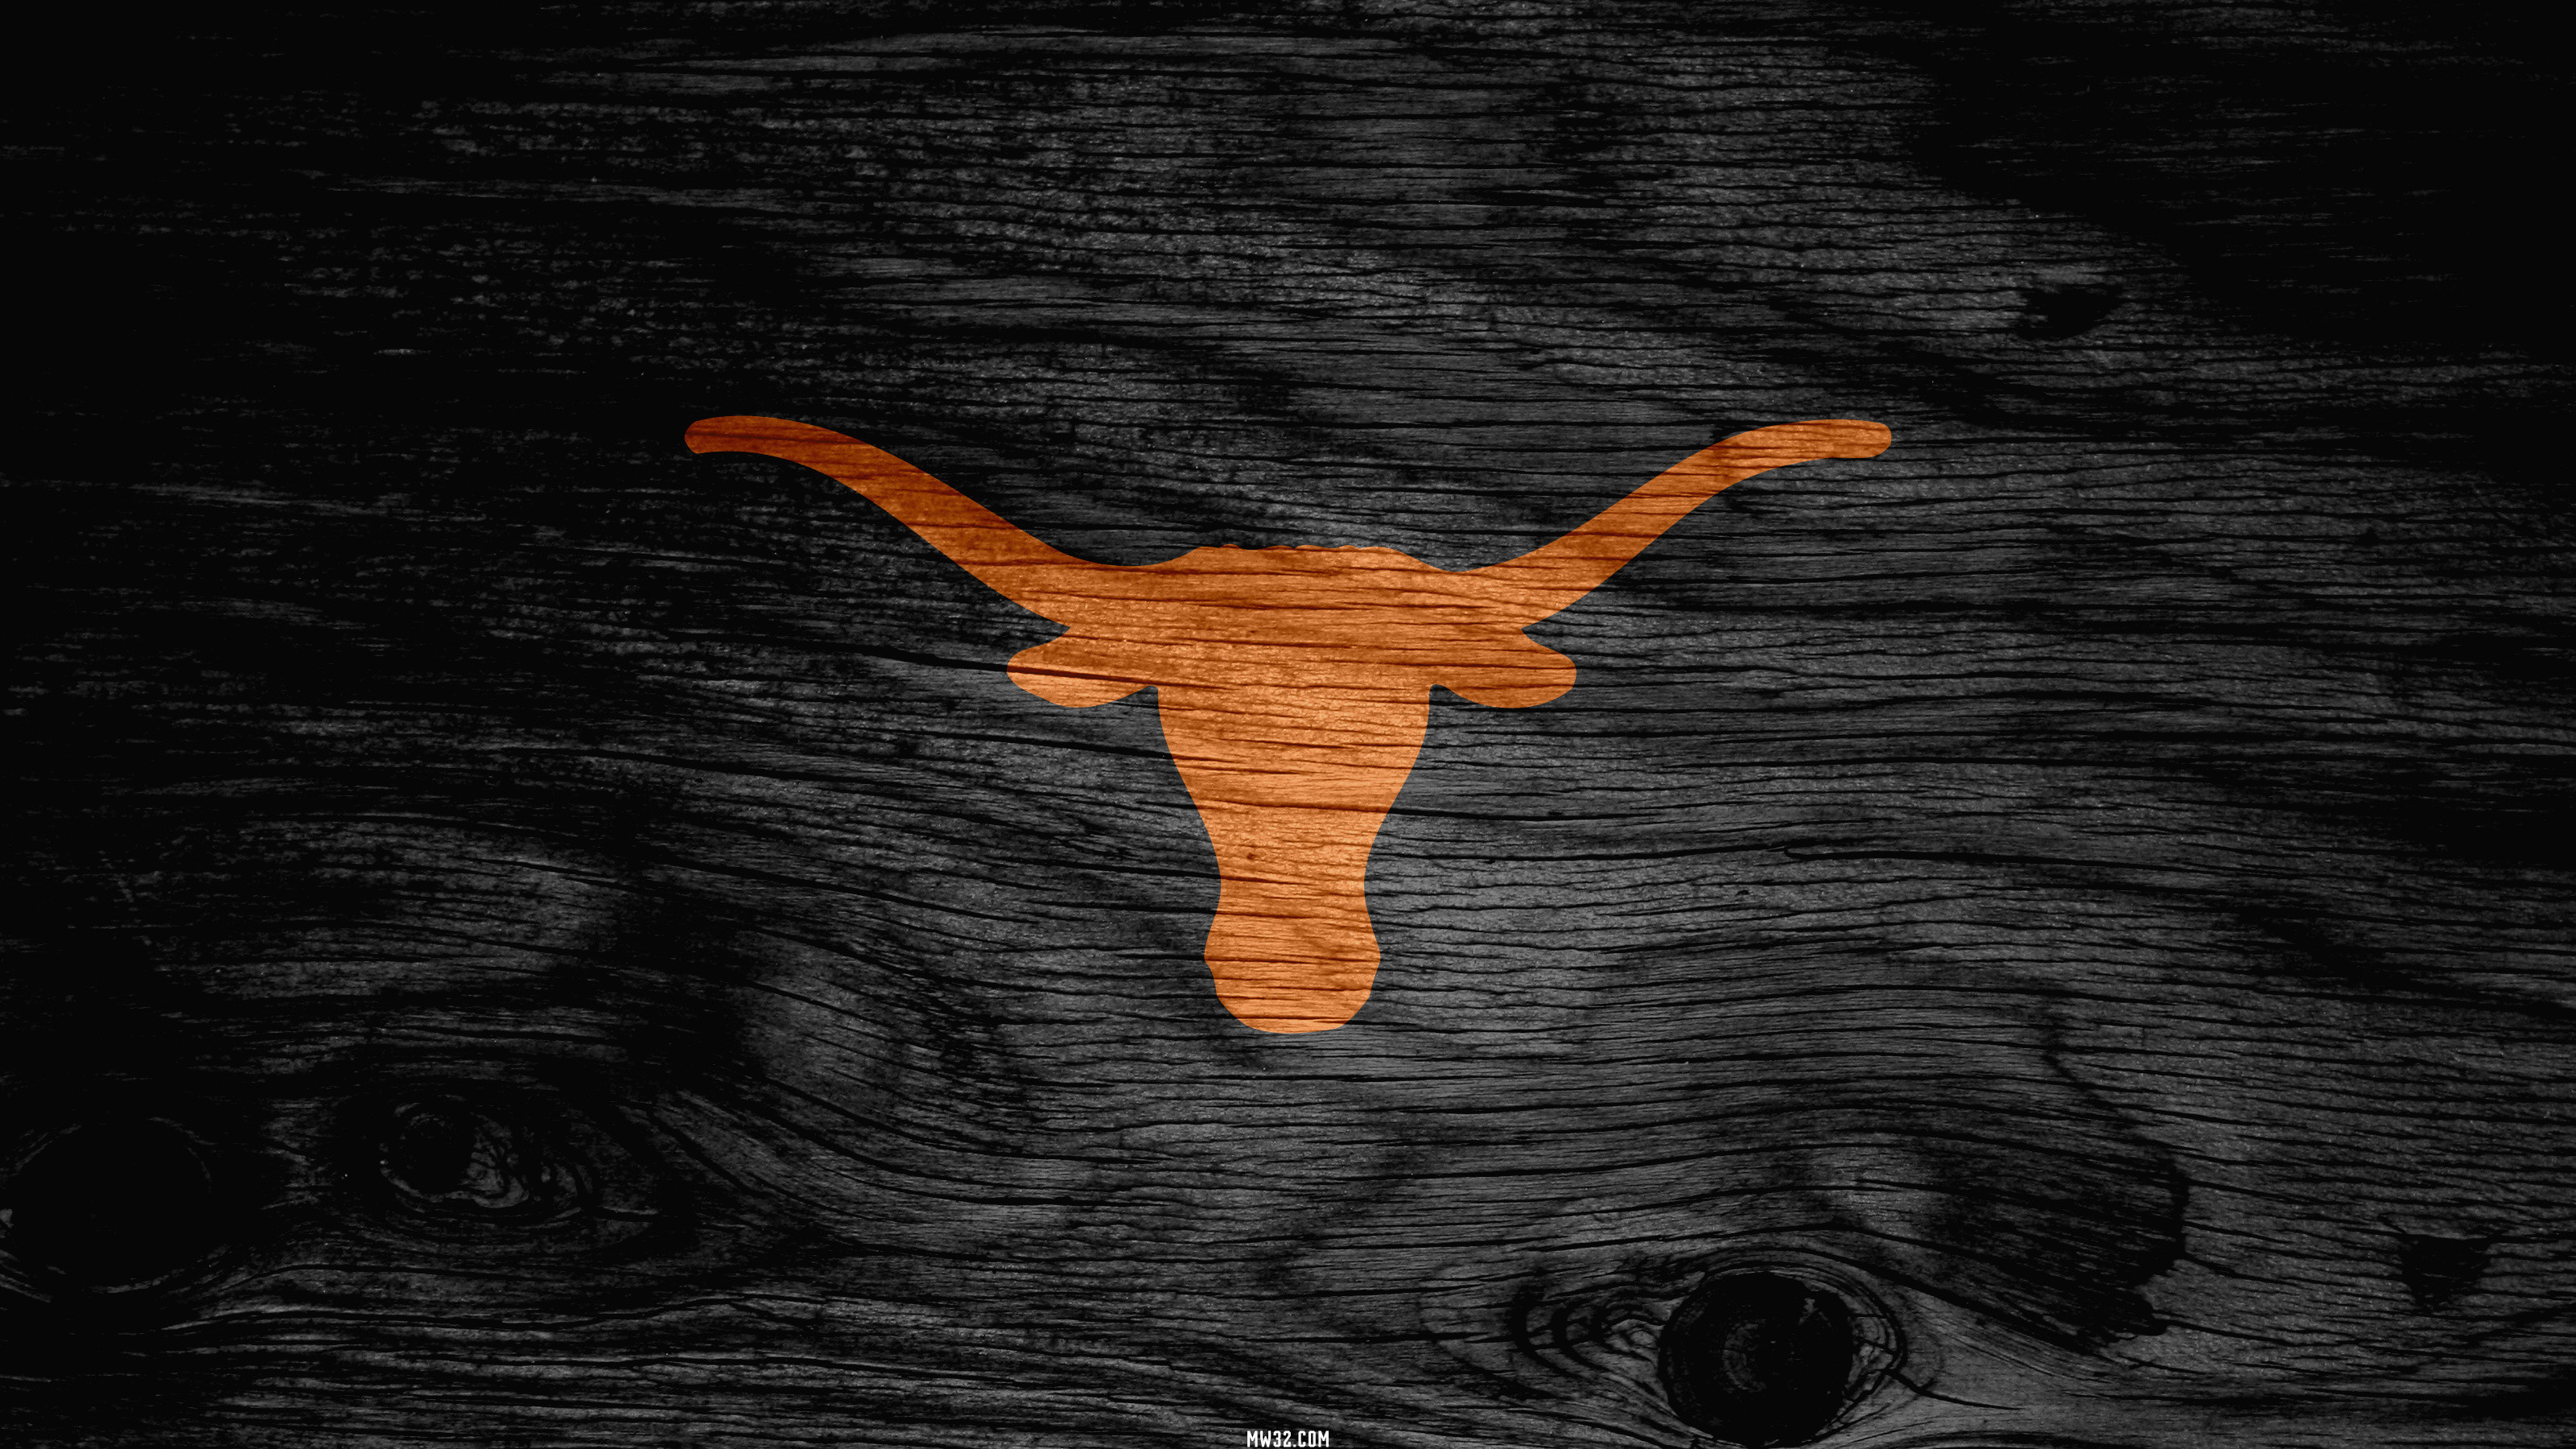 2013 NCAA FBS Weathered Wood Wallpapers – All 125 teams! [.